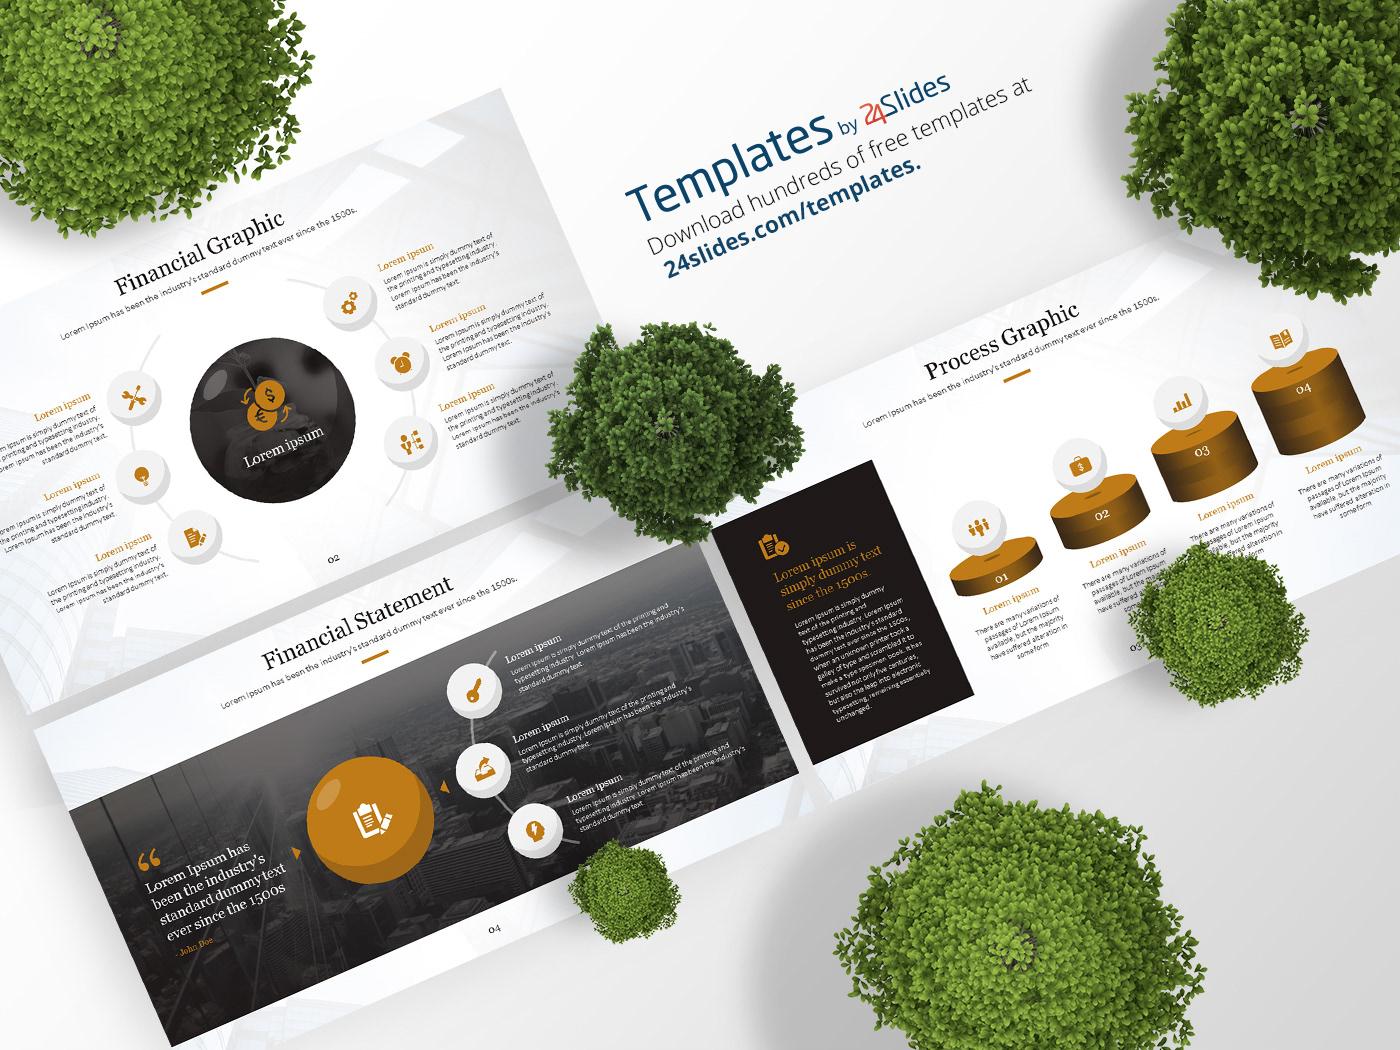 download corporate branding Free Template business presentation Presentation templates